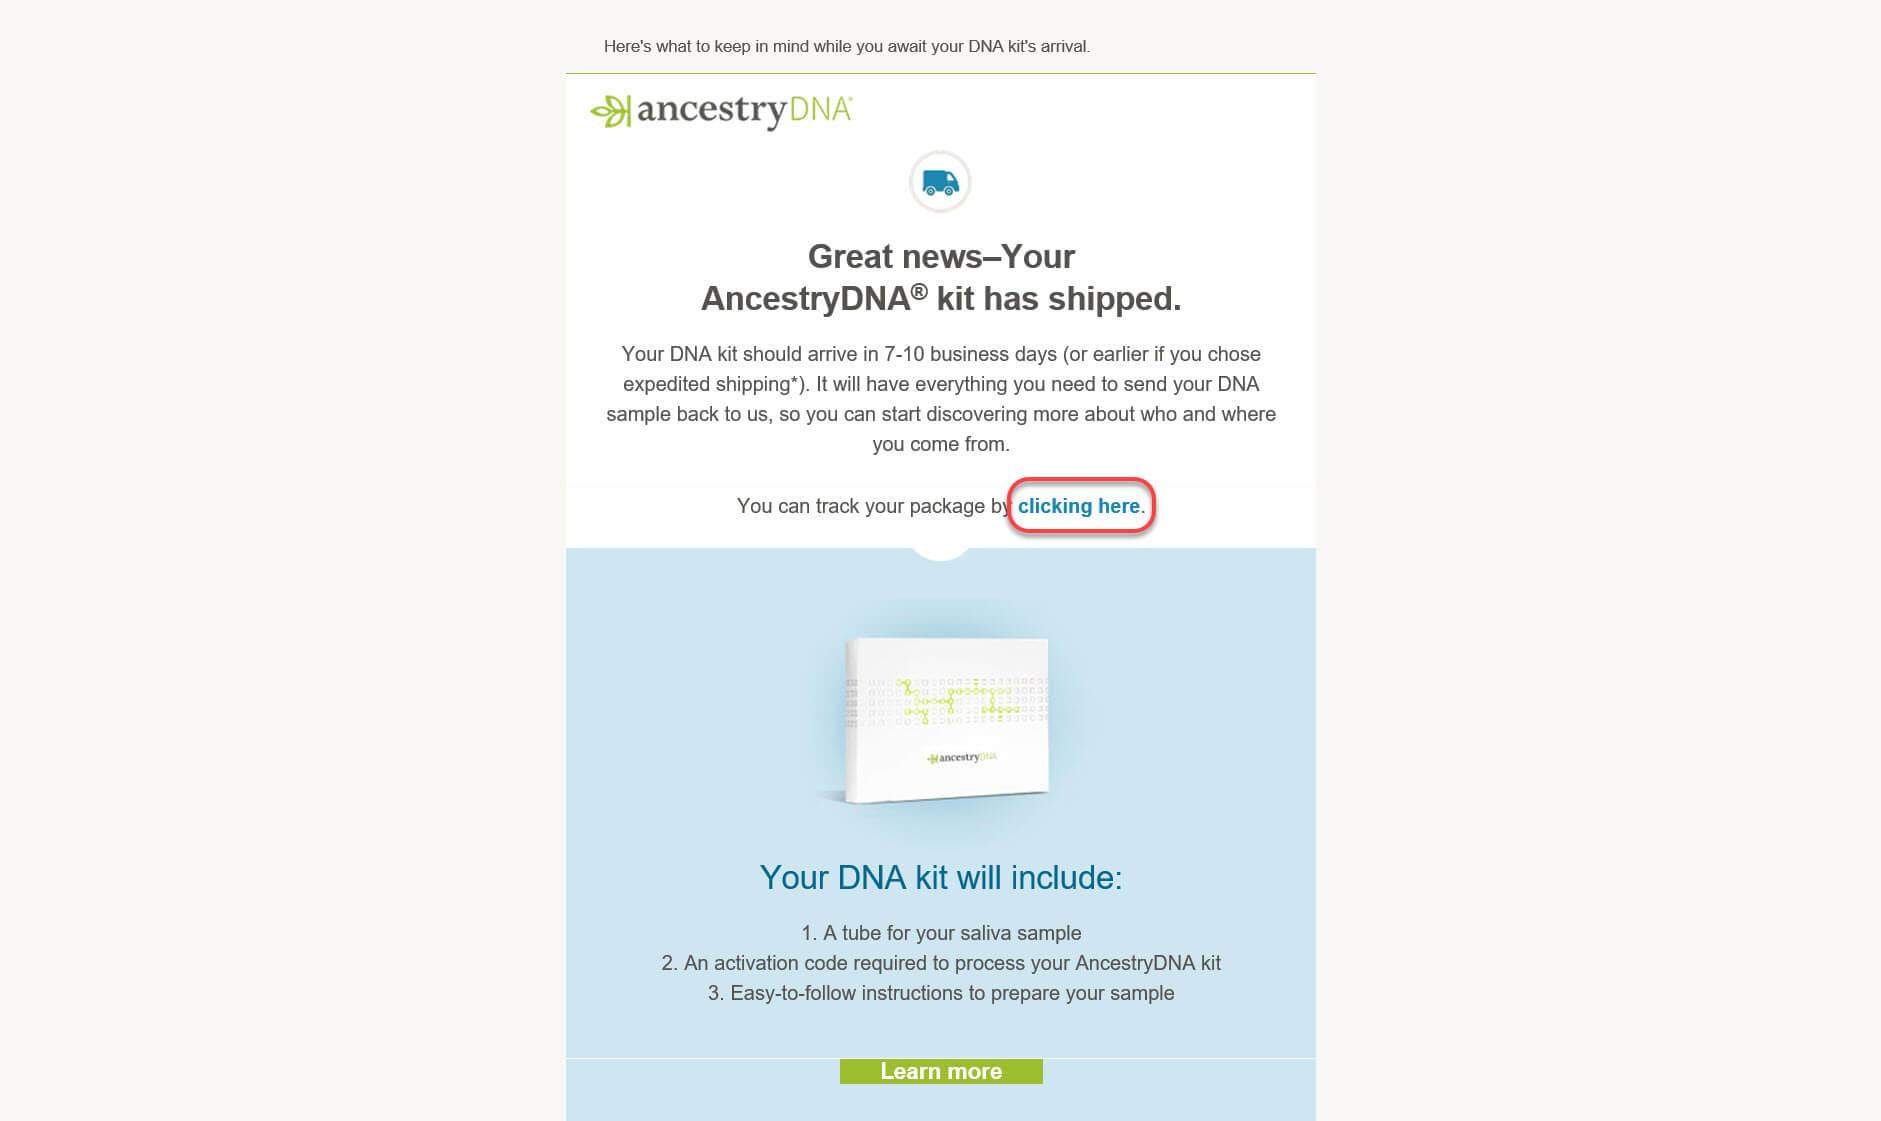 Tracking an AncestryDNA® Test